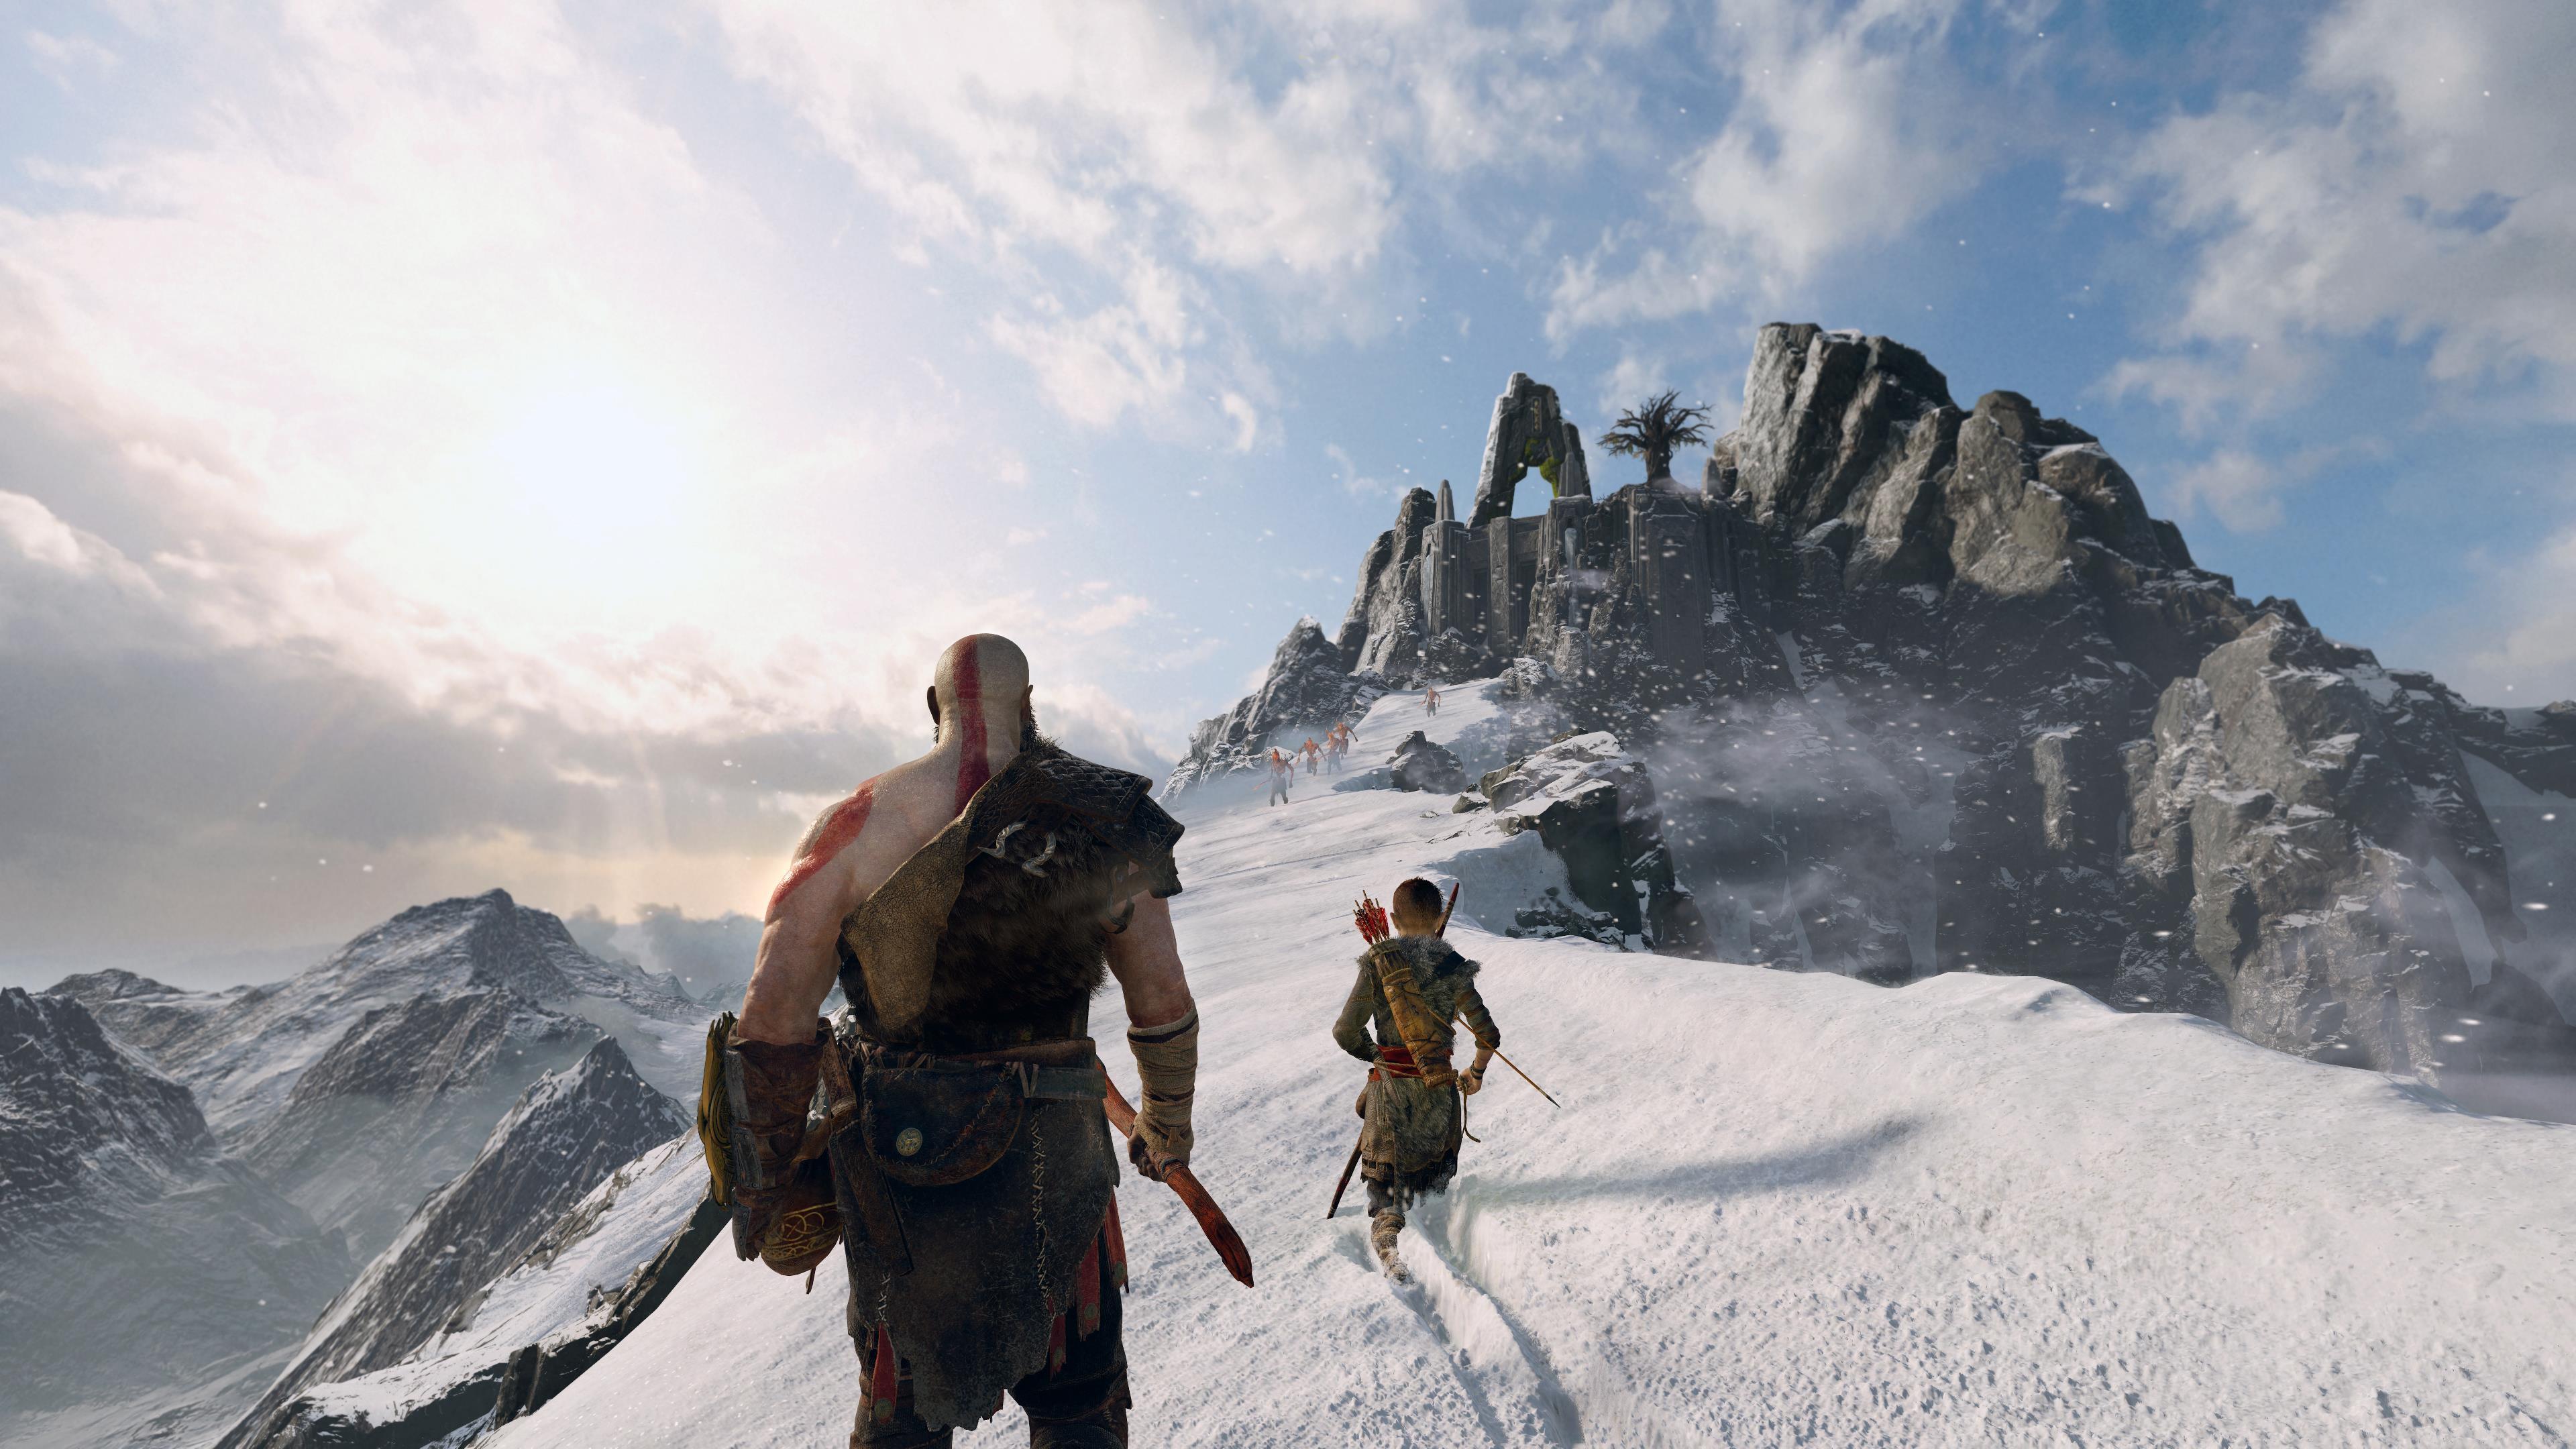 New God of War Trailer Released, Early 2018 Release Window – Capsule